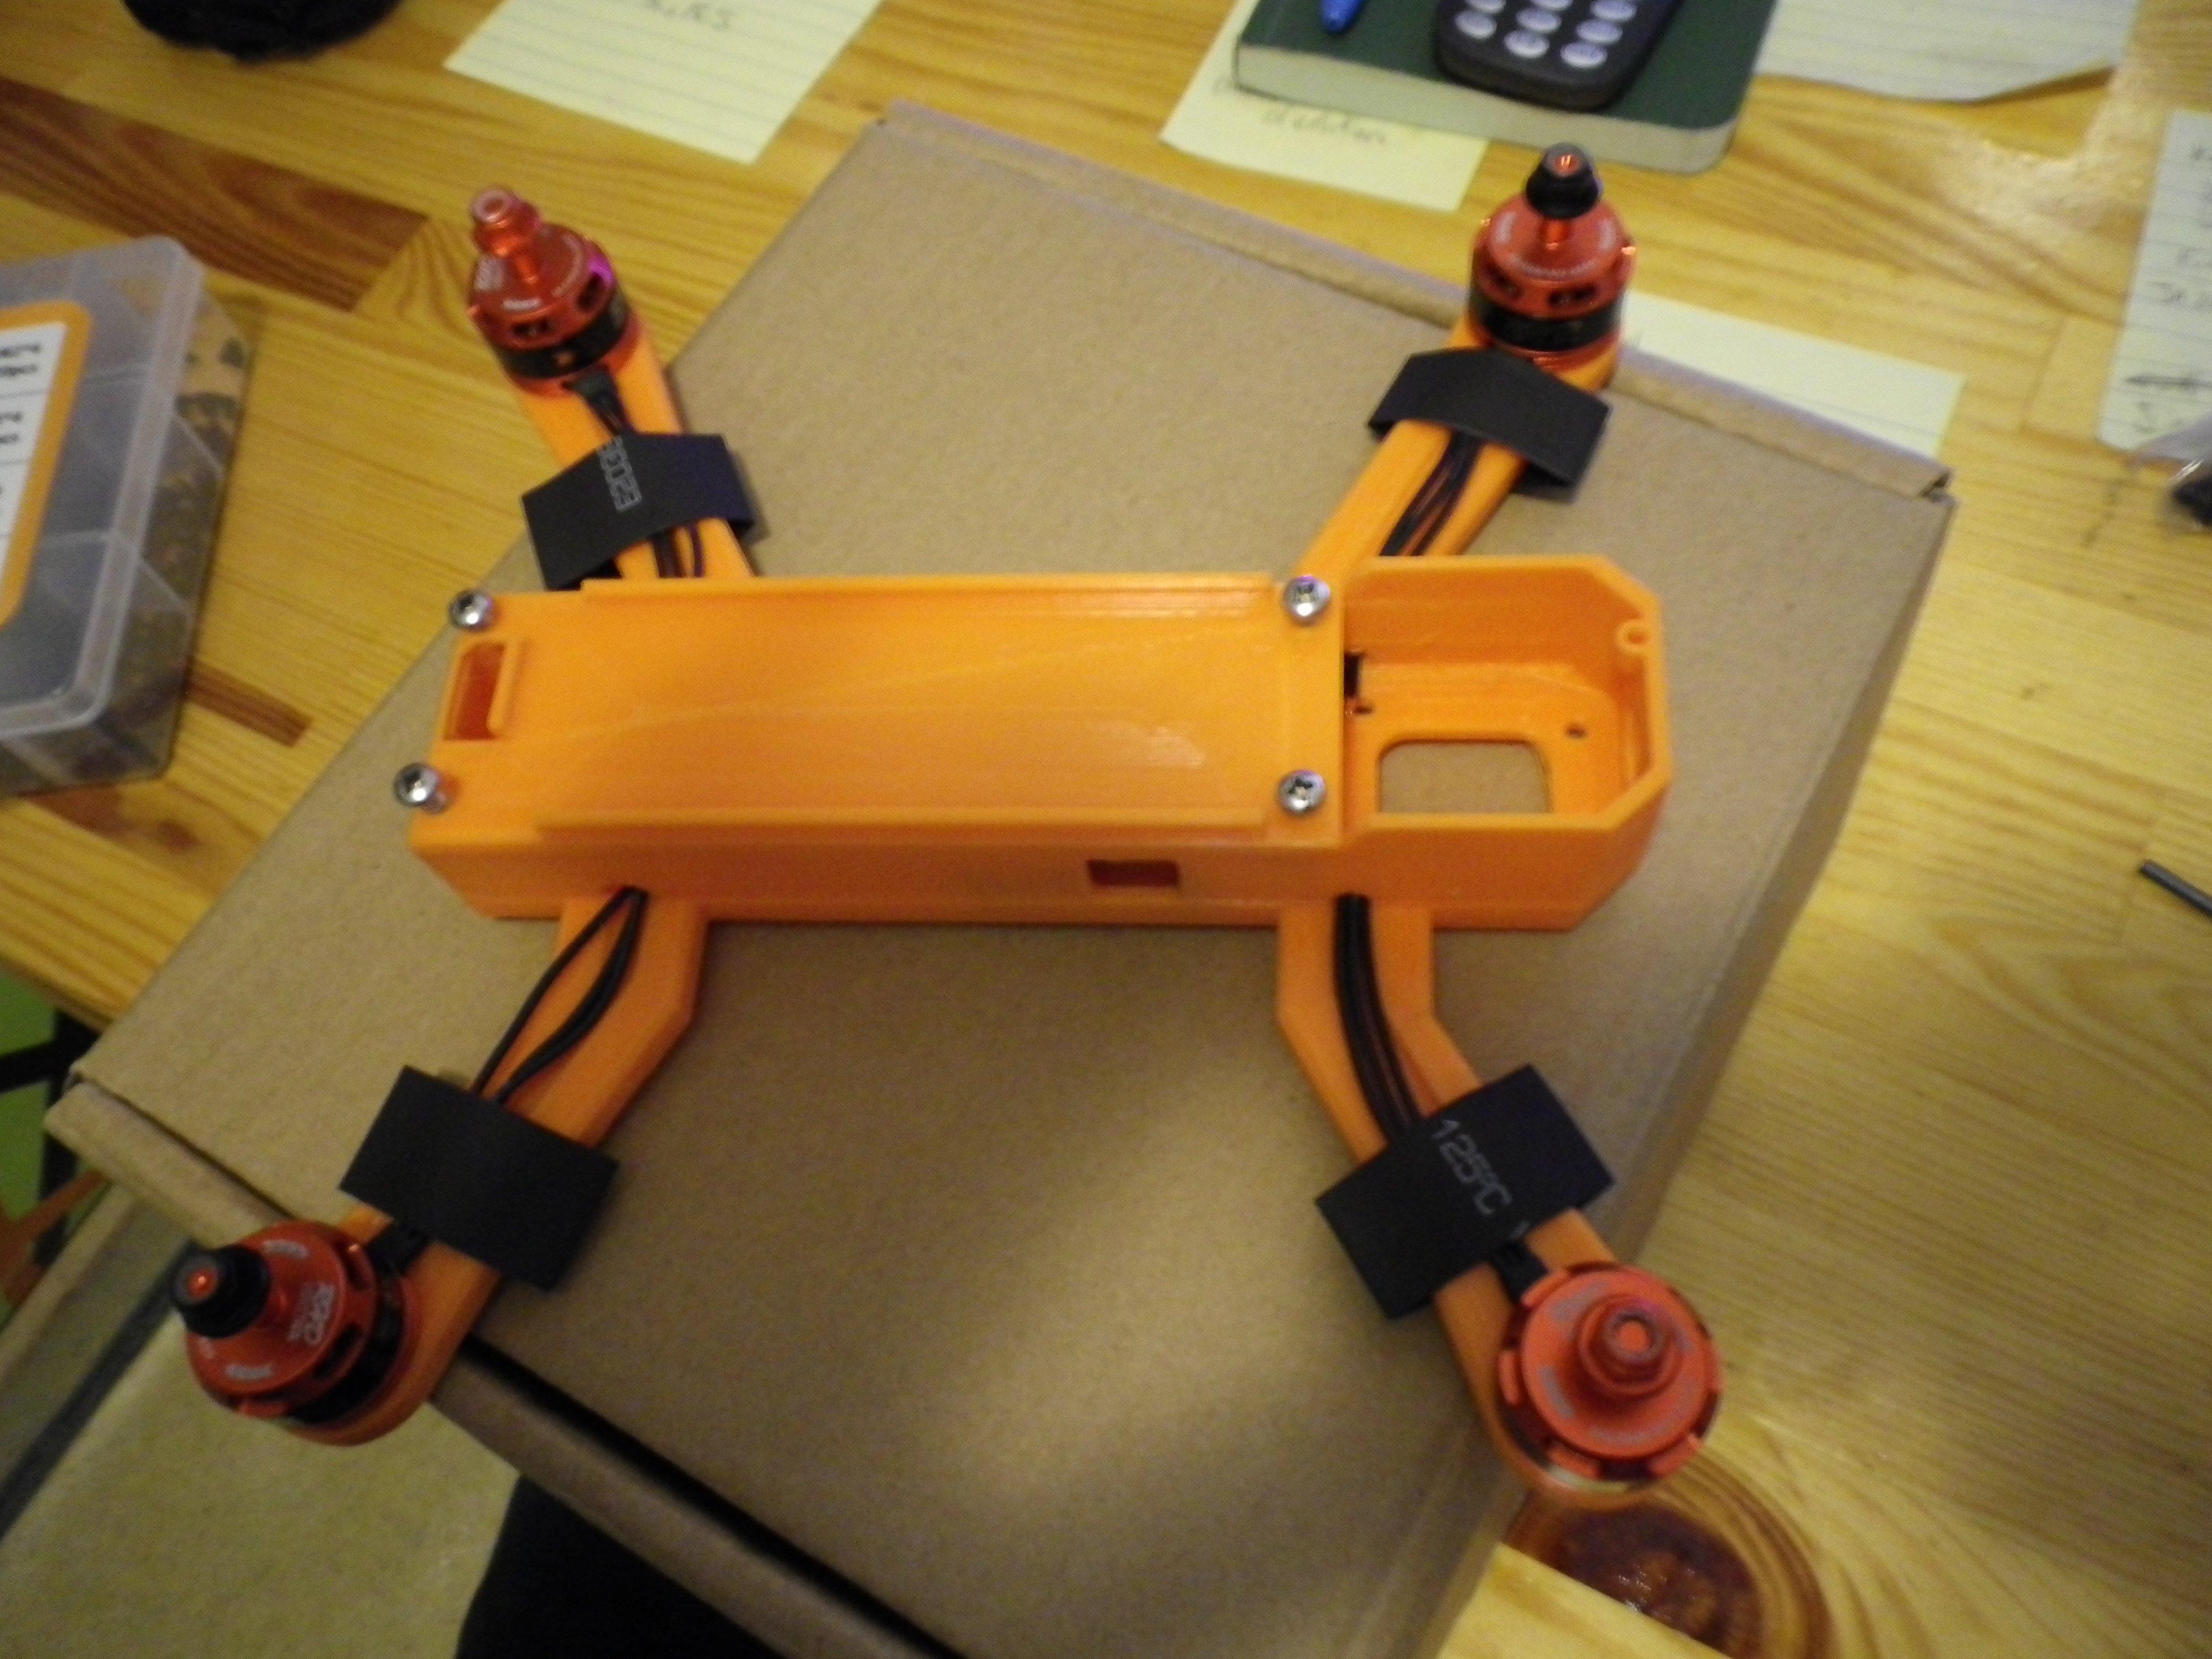 ProjectCuckoo WiFi Pineapple Nano Drone by tvbags